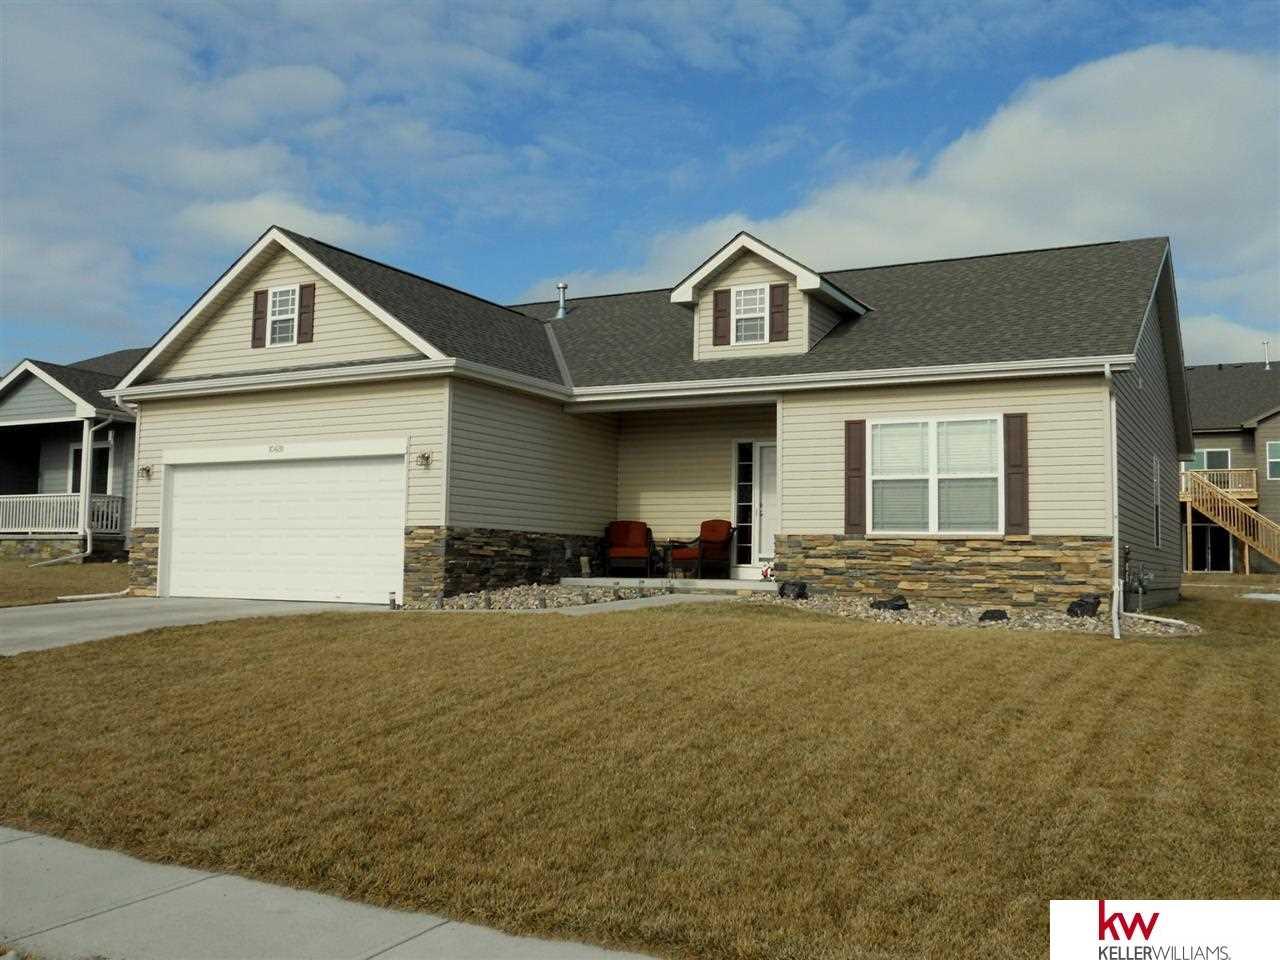 Real Estate for Sale, ListingId: 31843784, La Vista,NE68128